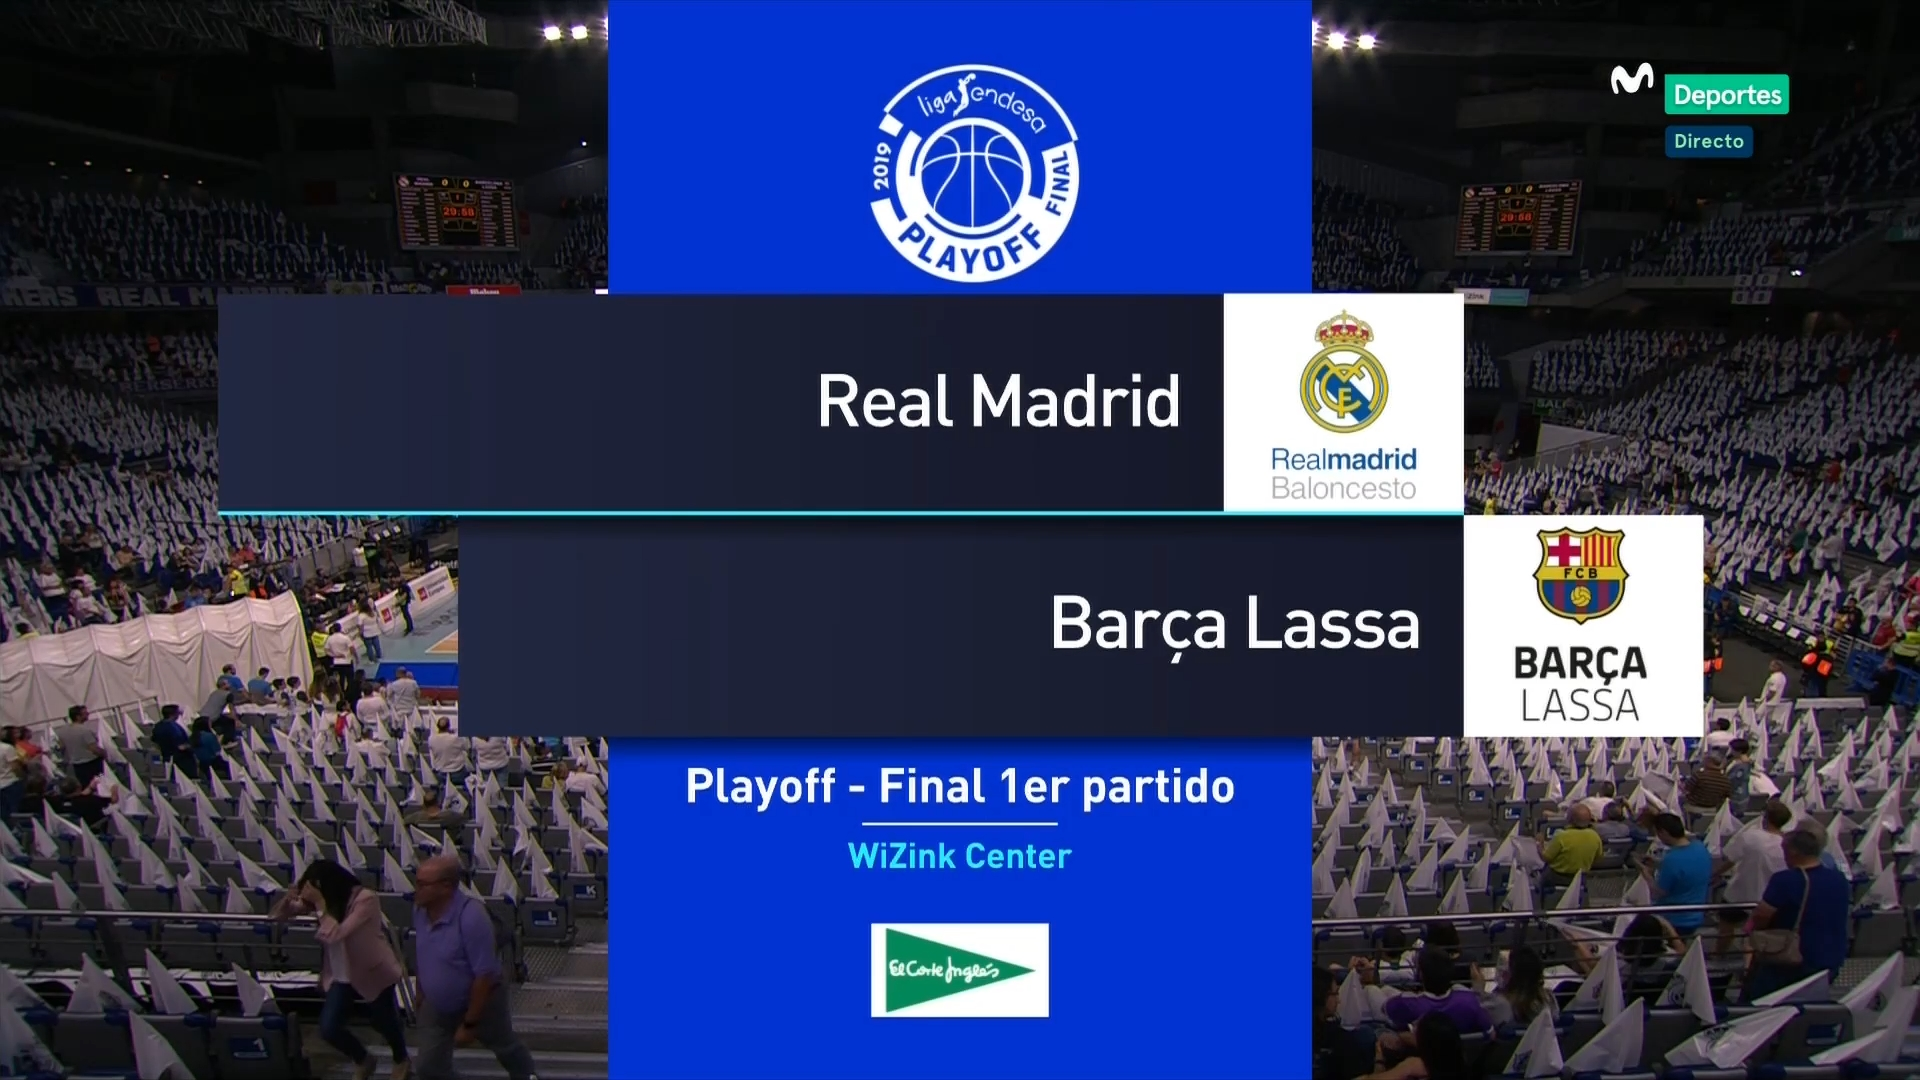 Финал Матч 1 Реал Мадрид - Барселона 15_06_2019-0-00-56-200.jpg